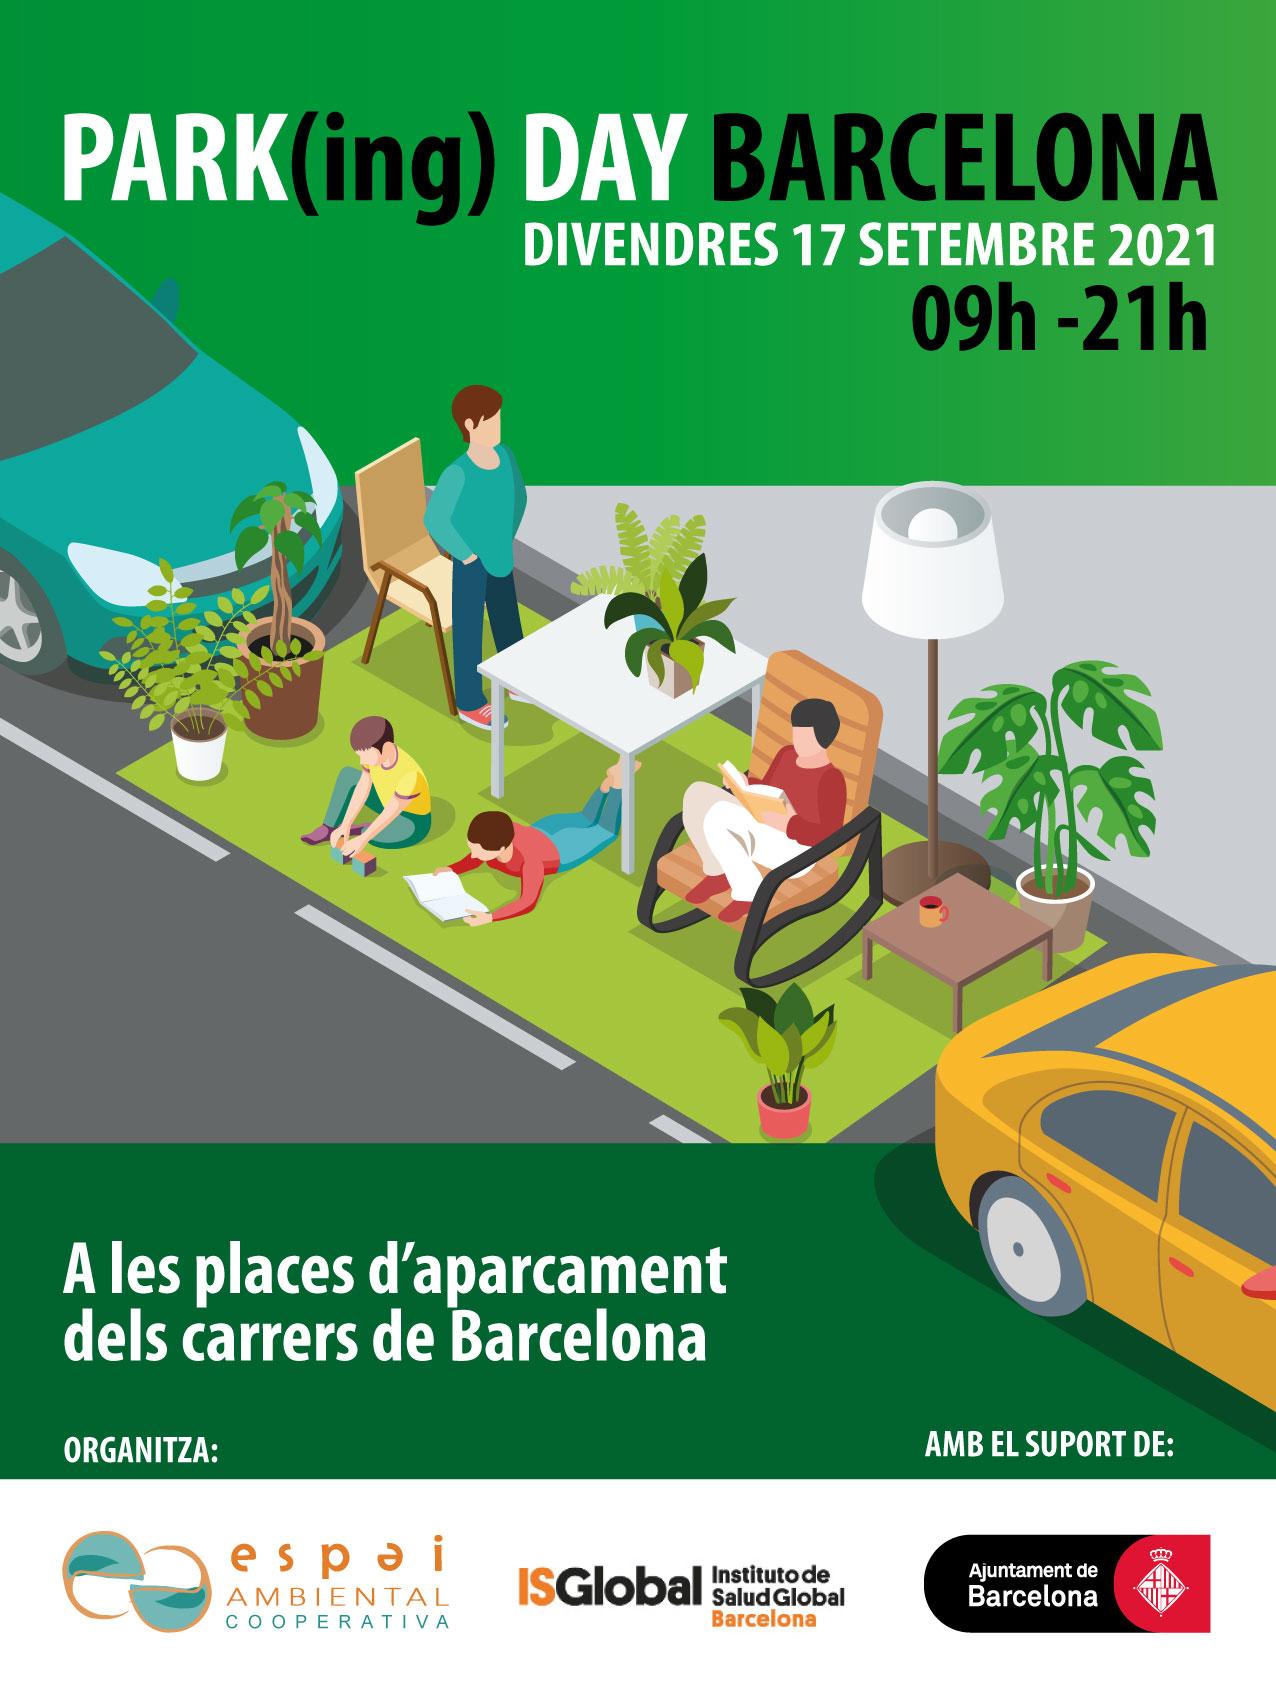 Parking Day Barcelona 2021